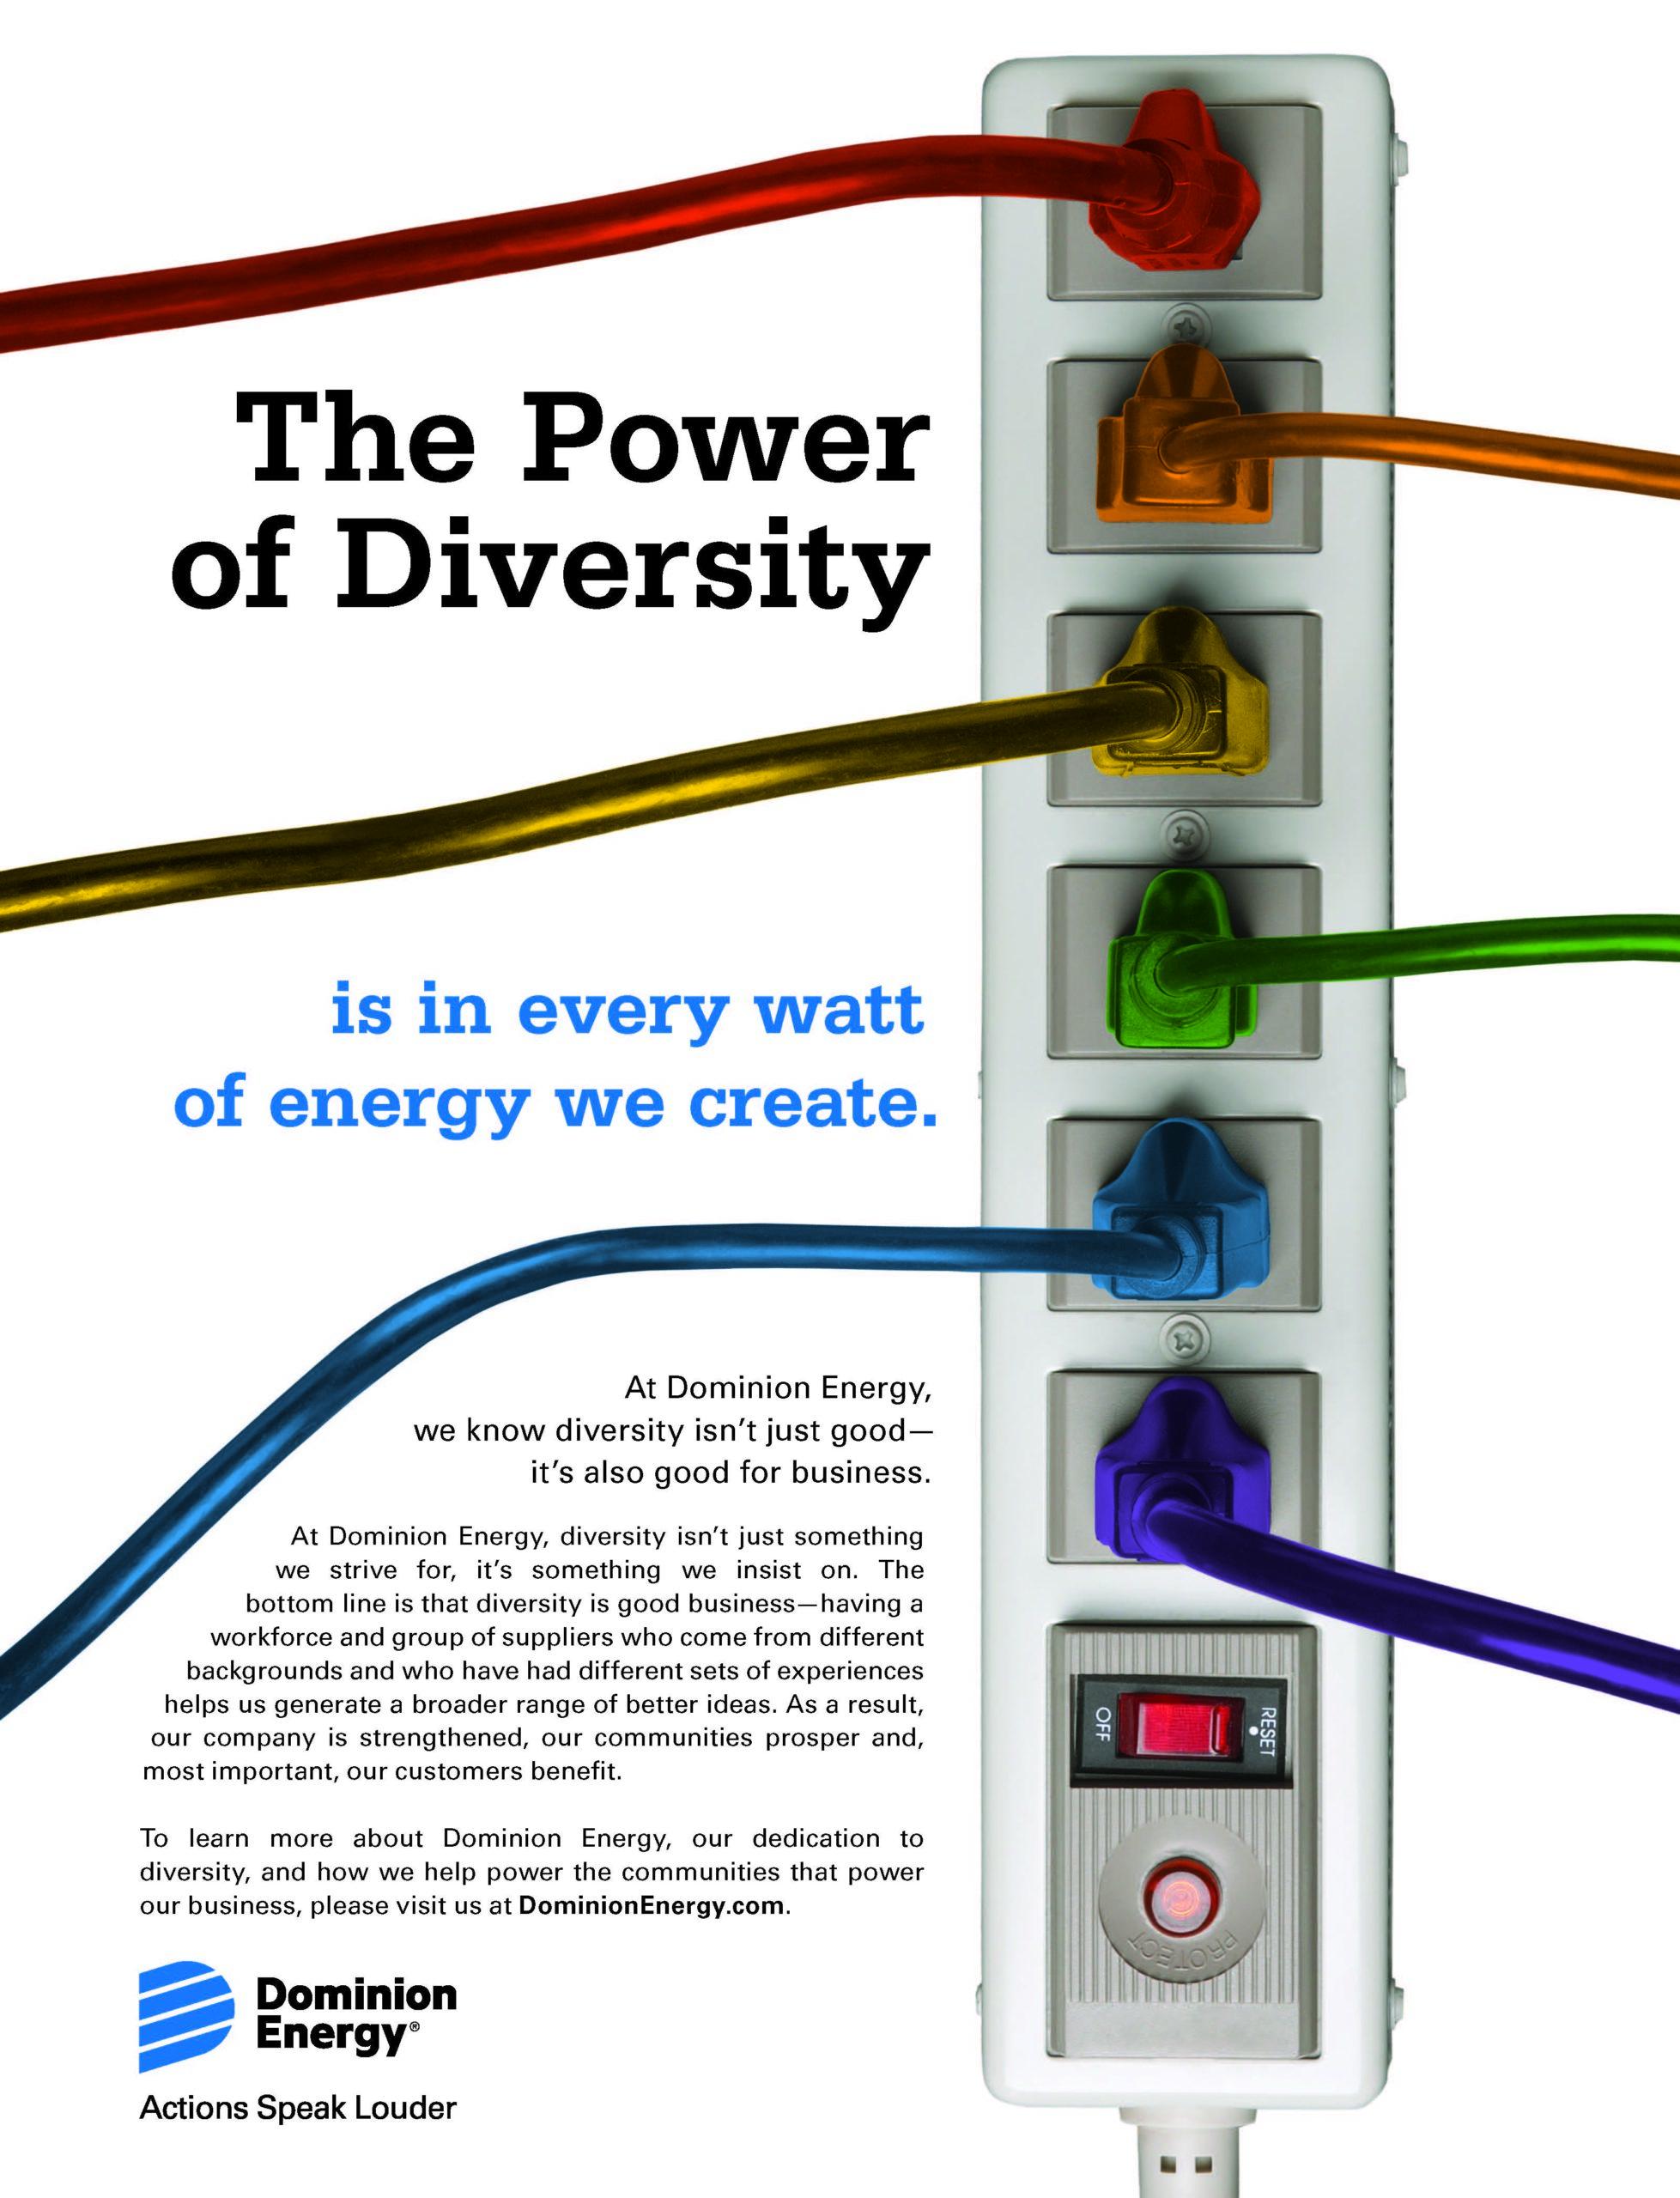 Ad: Dominion Energy